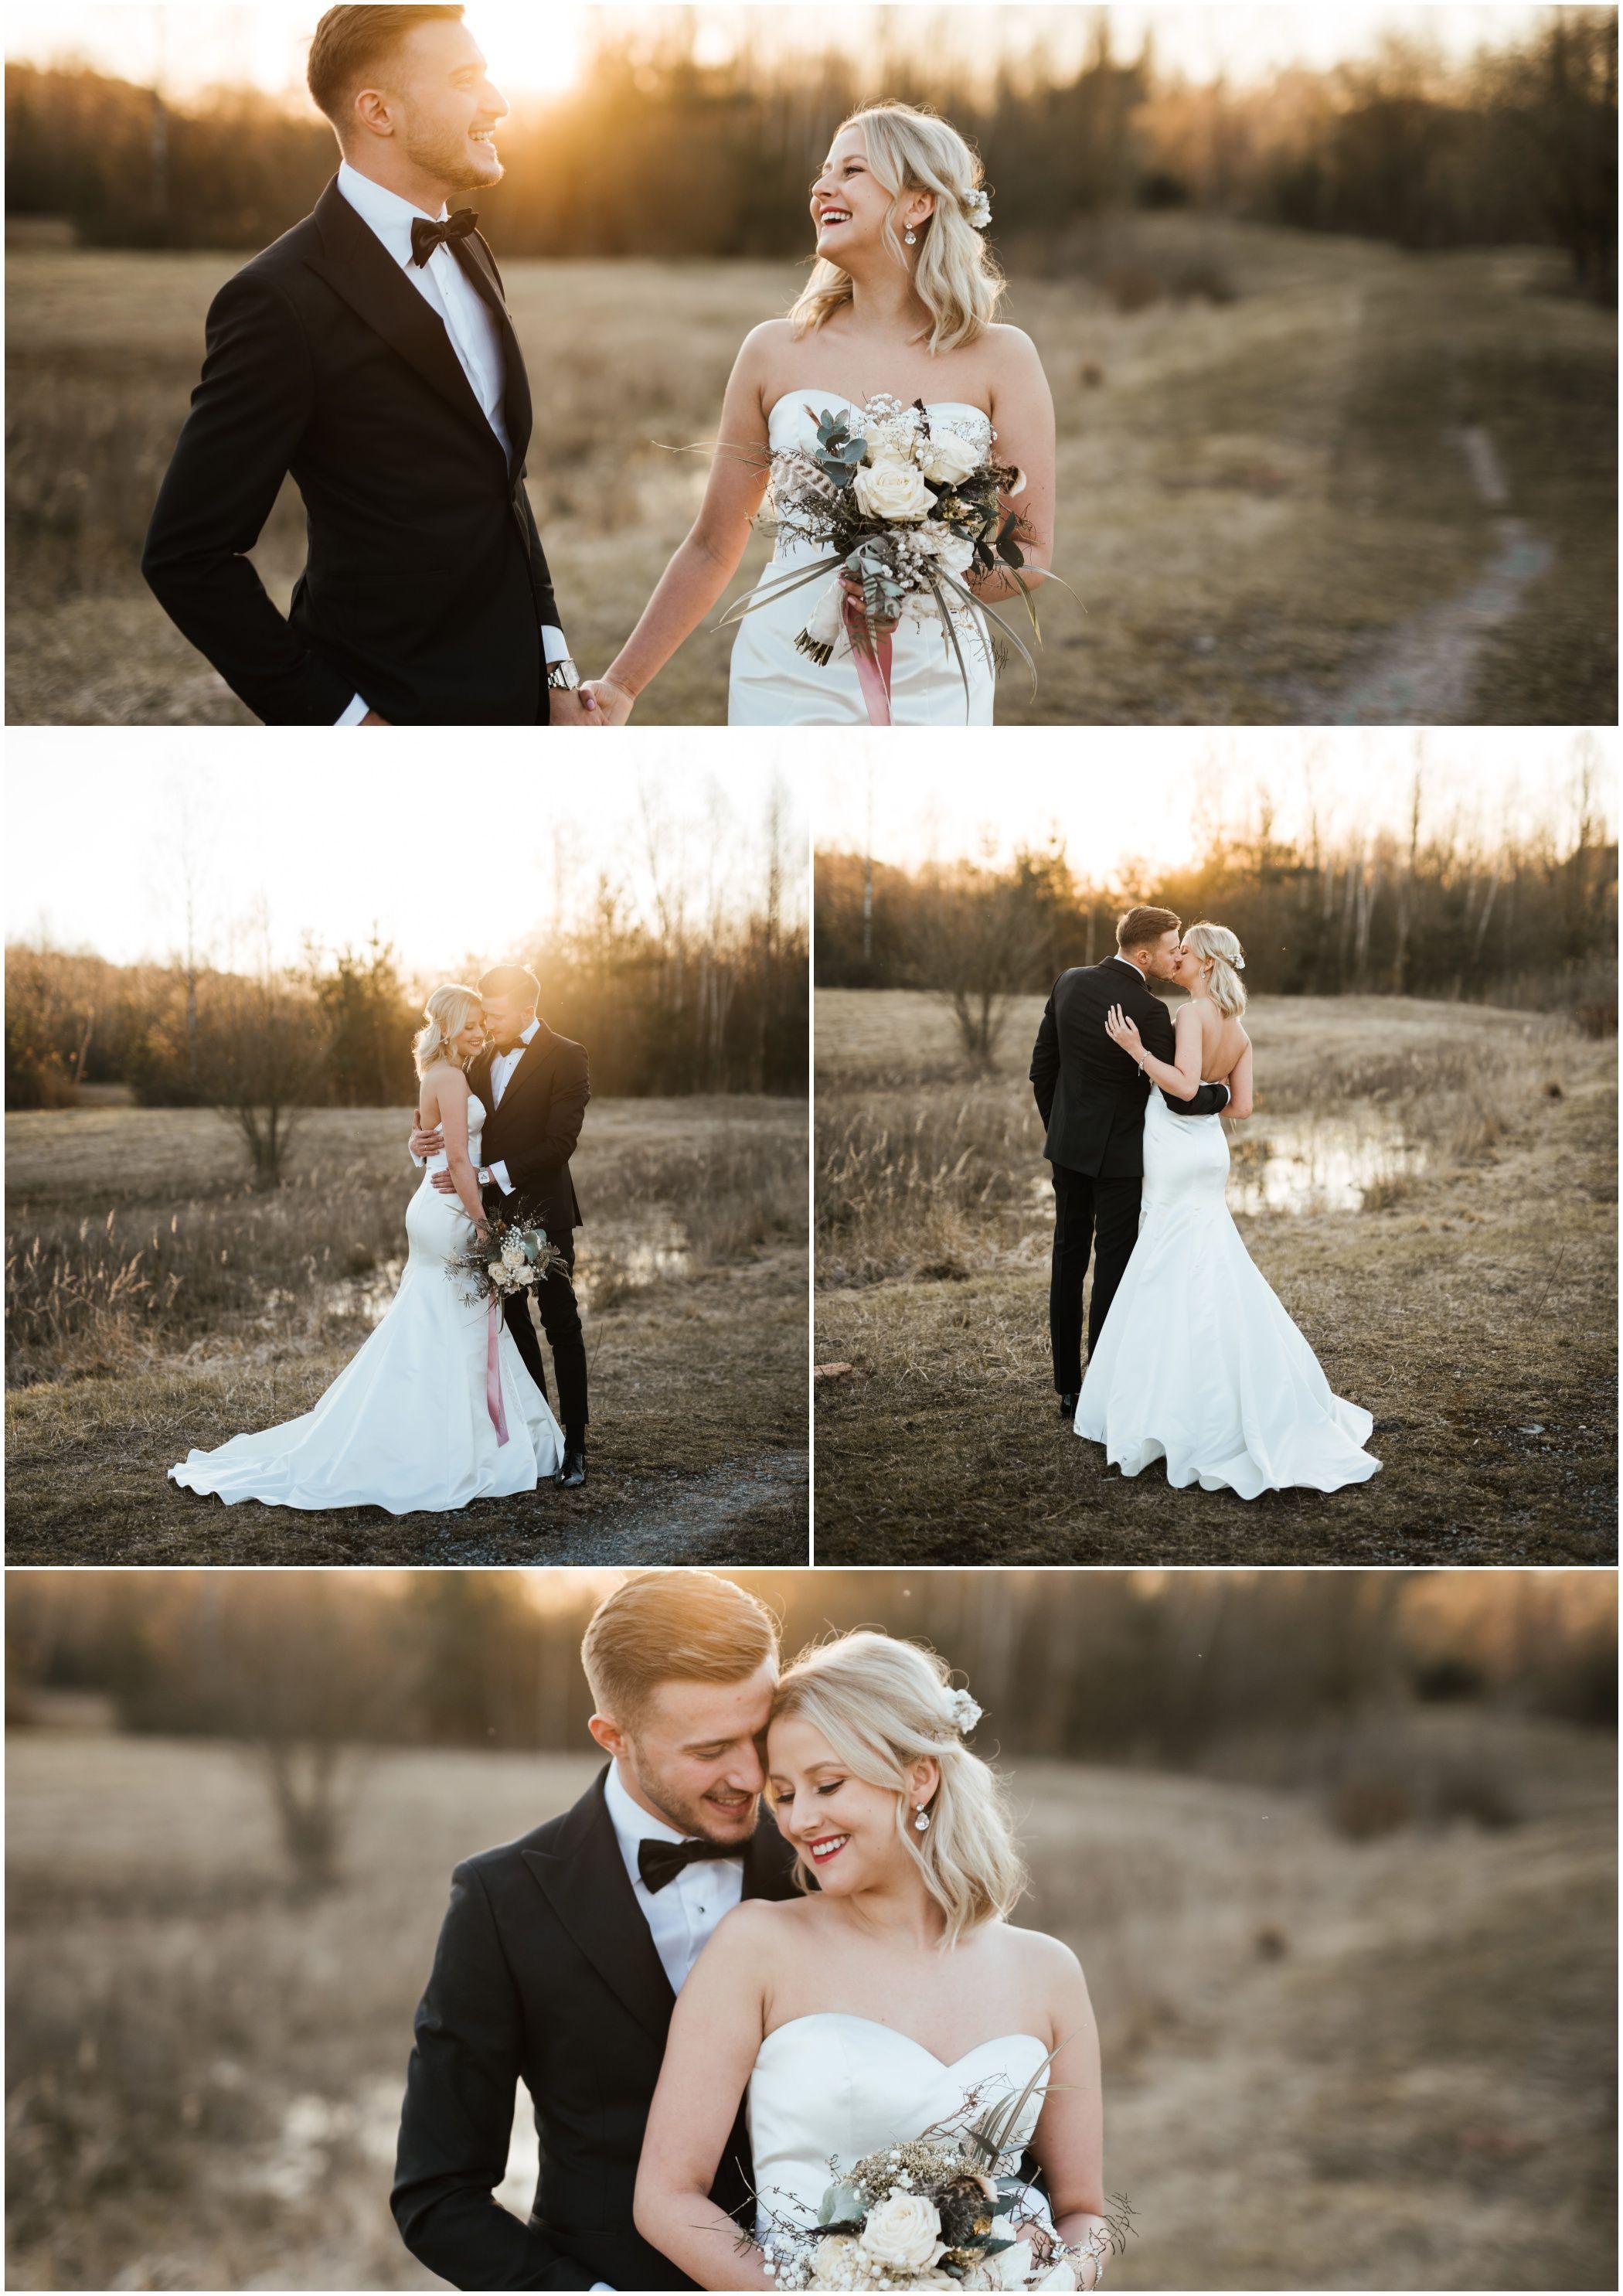 Sunset After Wedding Shoot Wedding Vintage Wedding Wedding Photos Weddingphotographer In 2020 Wedding Photos Wedding Photography Bride Wedding Photos Poses